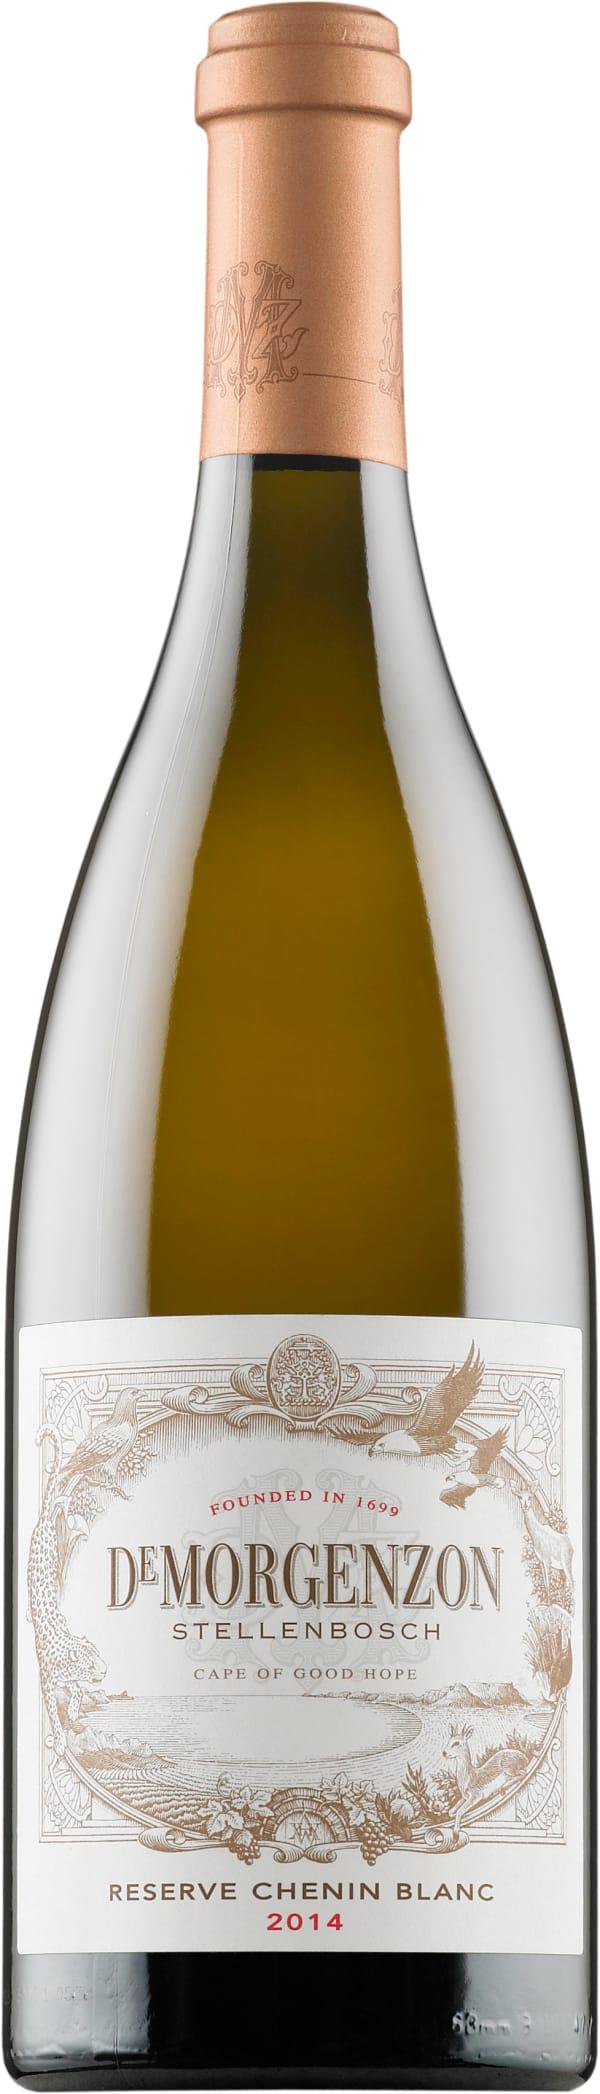 DeMorgenzon Reserve Chenin Blanc 2014